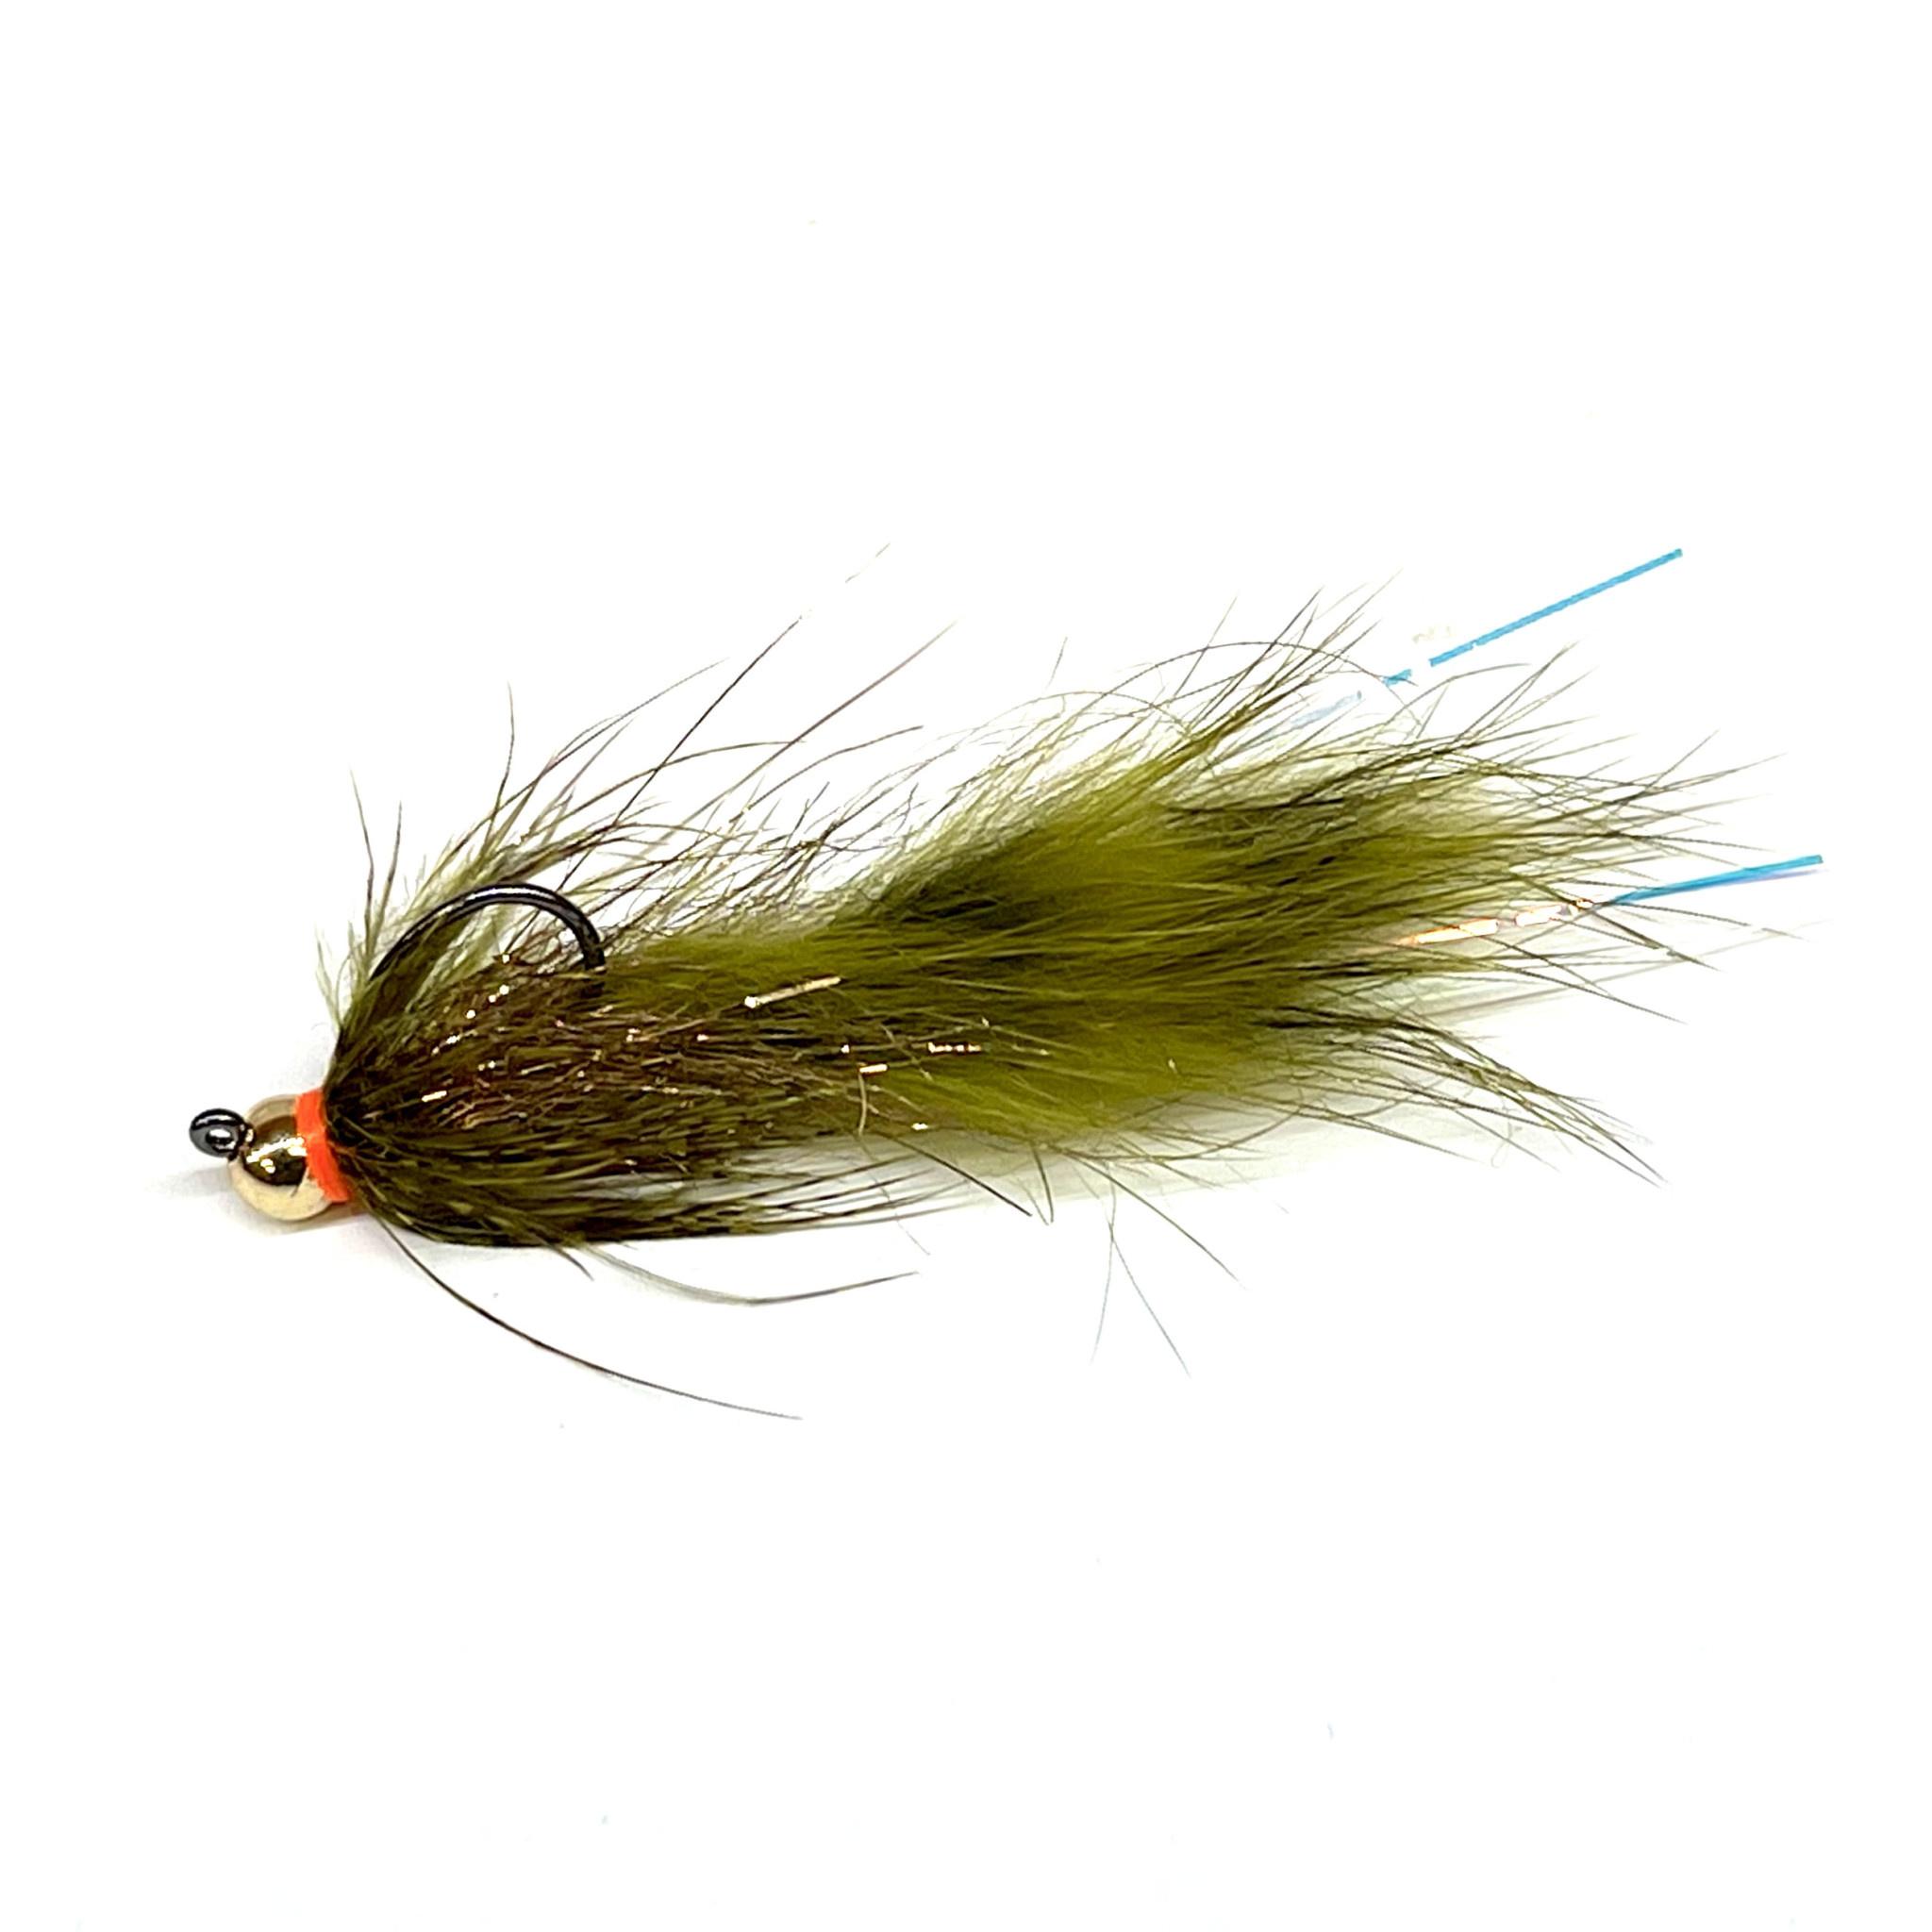 Glitterbomb Sculpin Fly Tying Kit